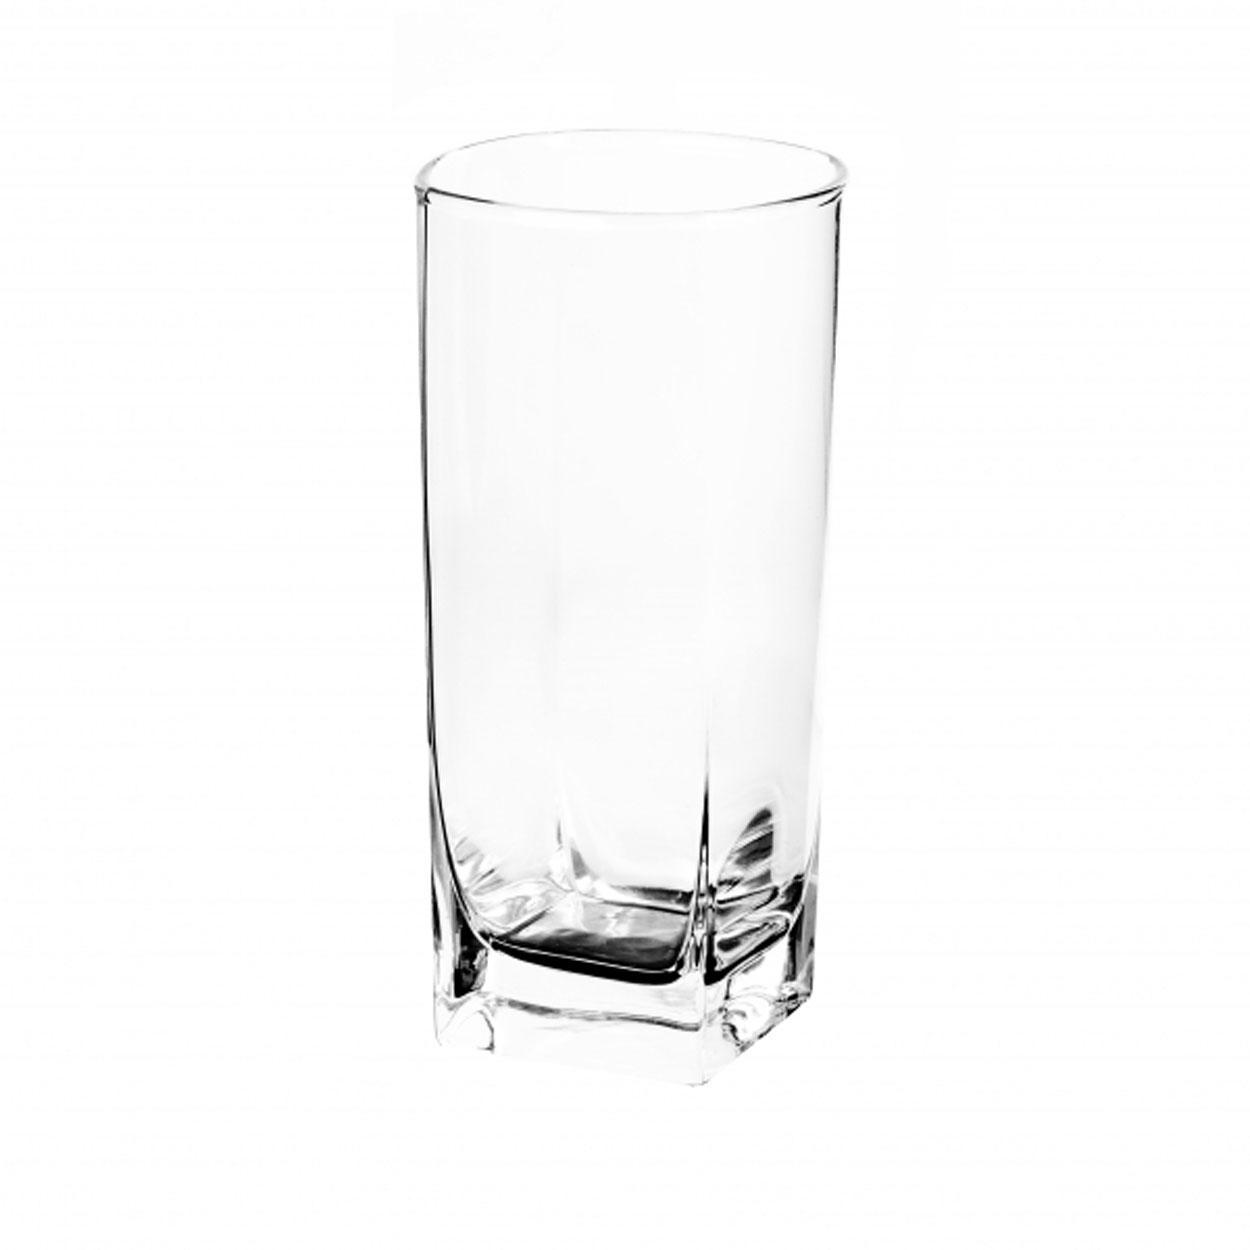 Набор стаканов Luminarc Стерлинг, 330 мл, 6 шт набор стаканов luminarc magda 270 мл